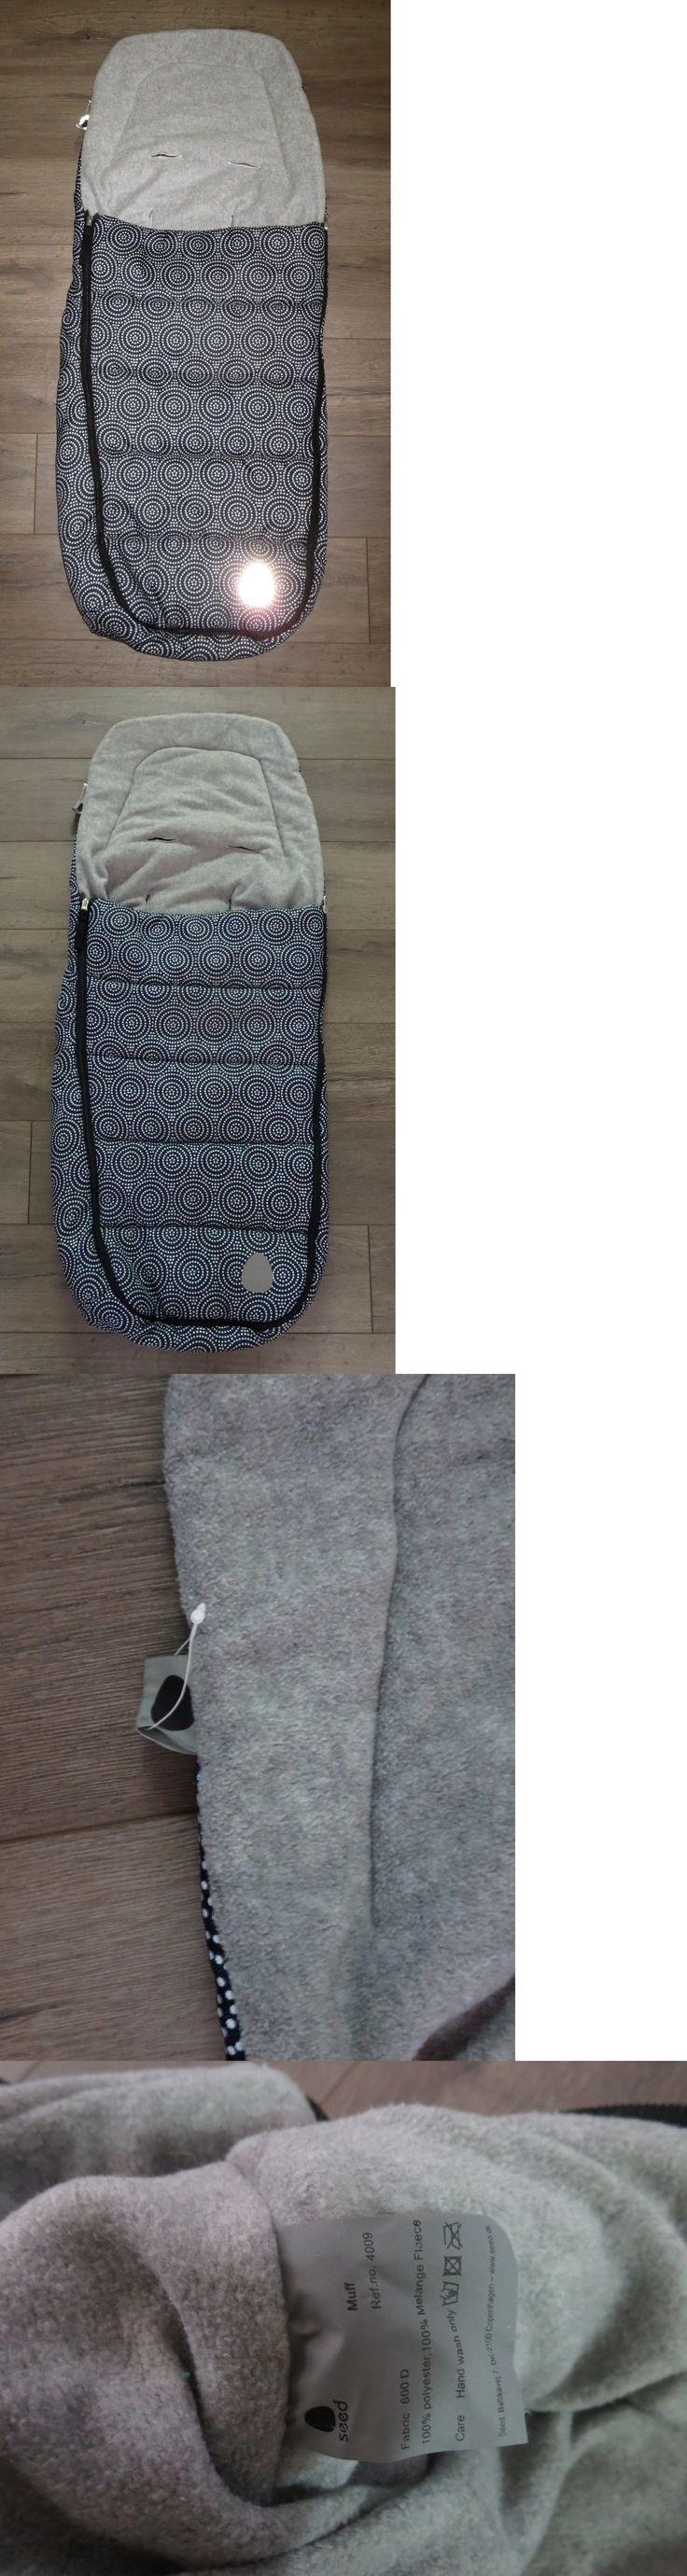 Footmuffs 116553: New Baby Infant Seed Foot Muff Sleeping Bag For Pli Mg Pram Stroller Print -> BUY IT NOW ONLY: $99.99 on eBay!